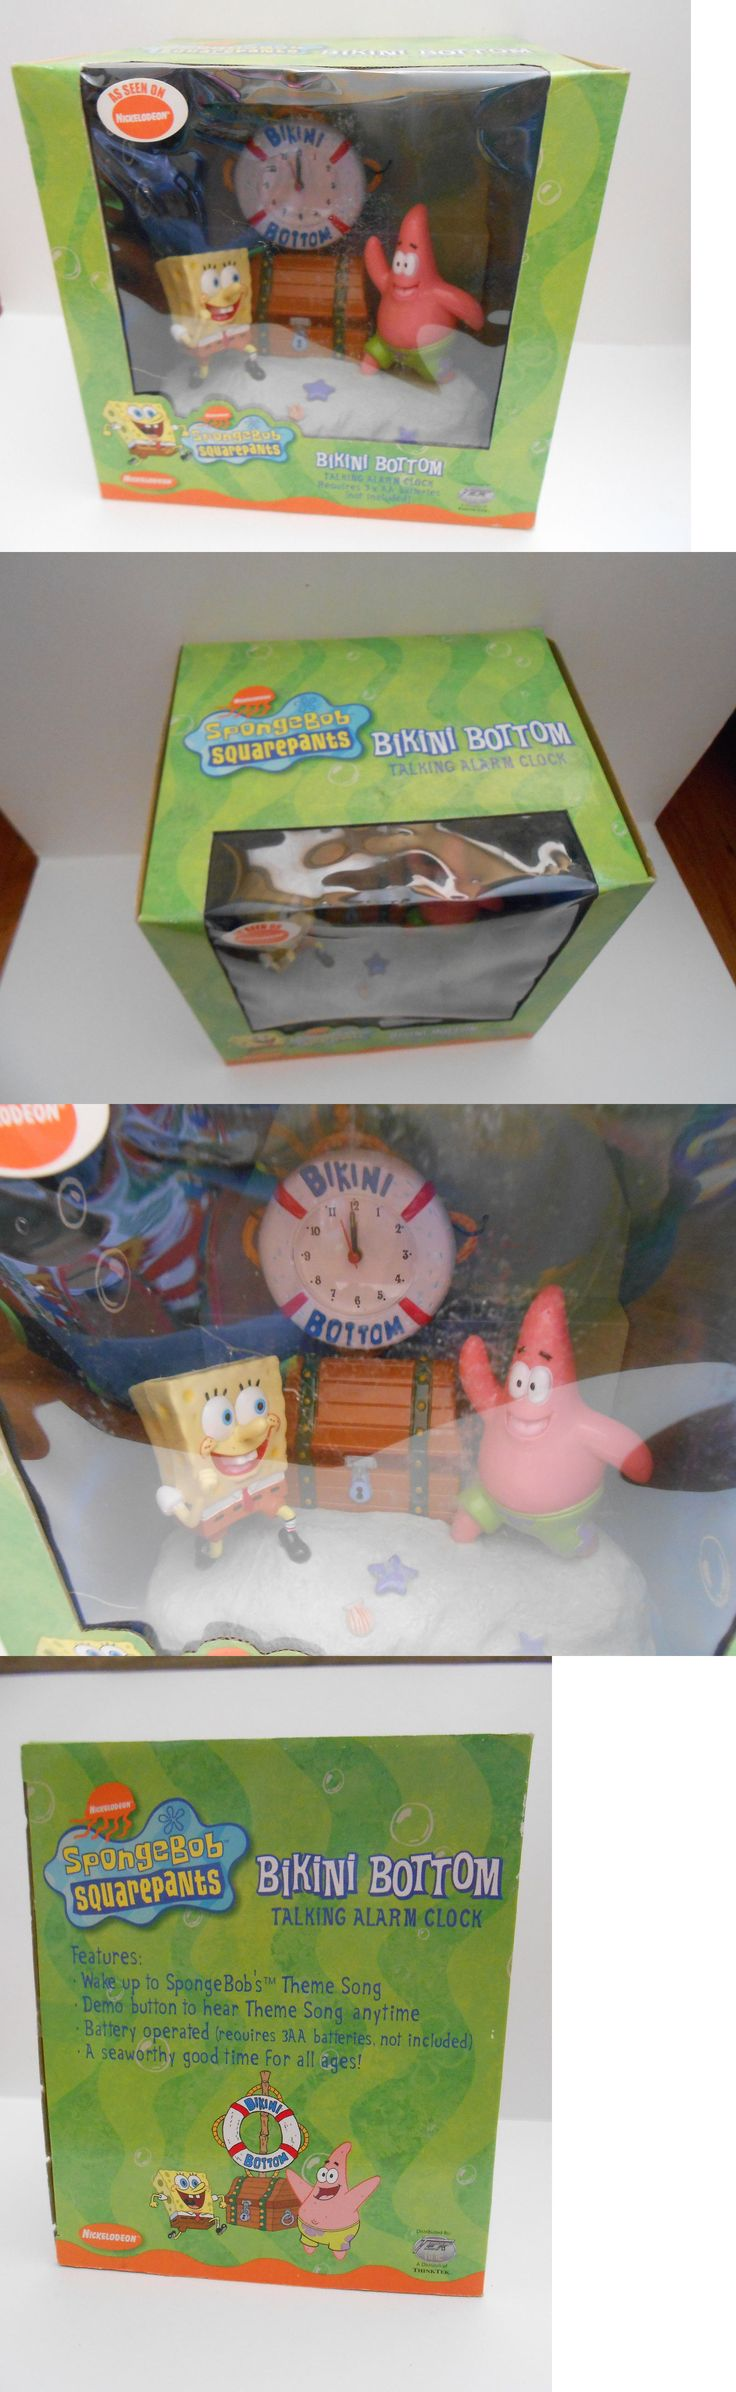 SpongeBob Squarepants 20919: Nickelodeon Spongebob Squarepants Bikini Bottom Talking Alarm Clock -> BUY IT NOW ONLY: $45.95 on eBay!